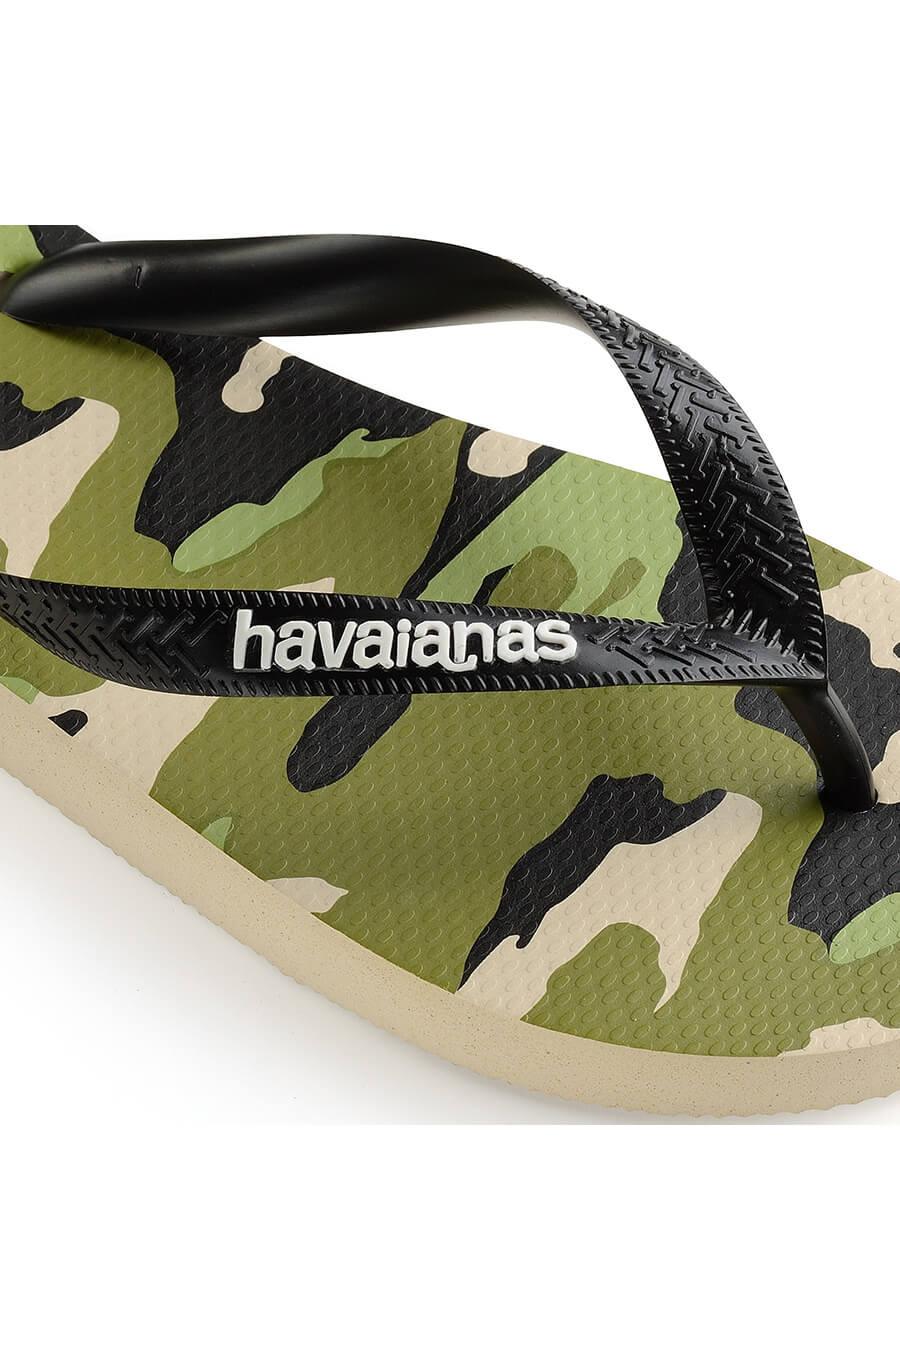 CIABATTE HAVAIANAS 94461 uomo verde | Pittarello